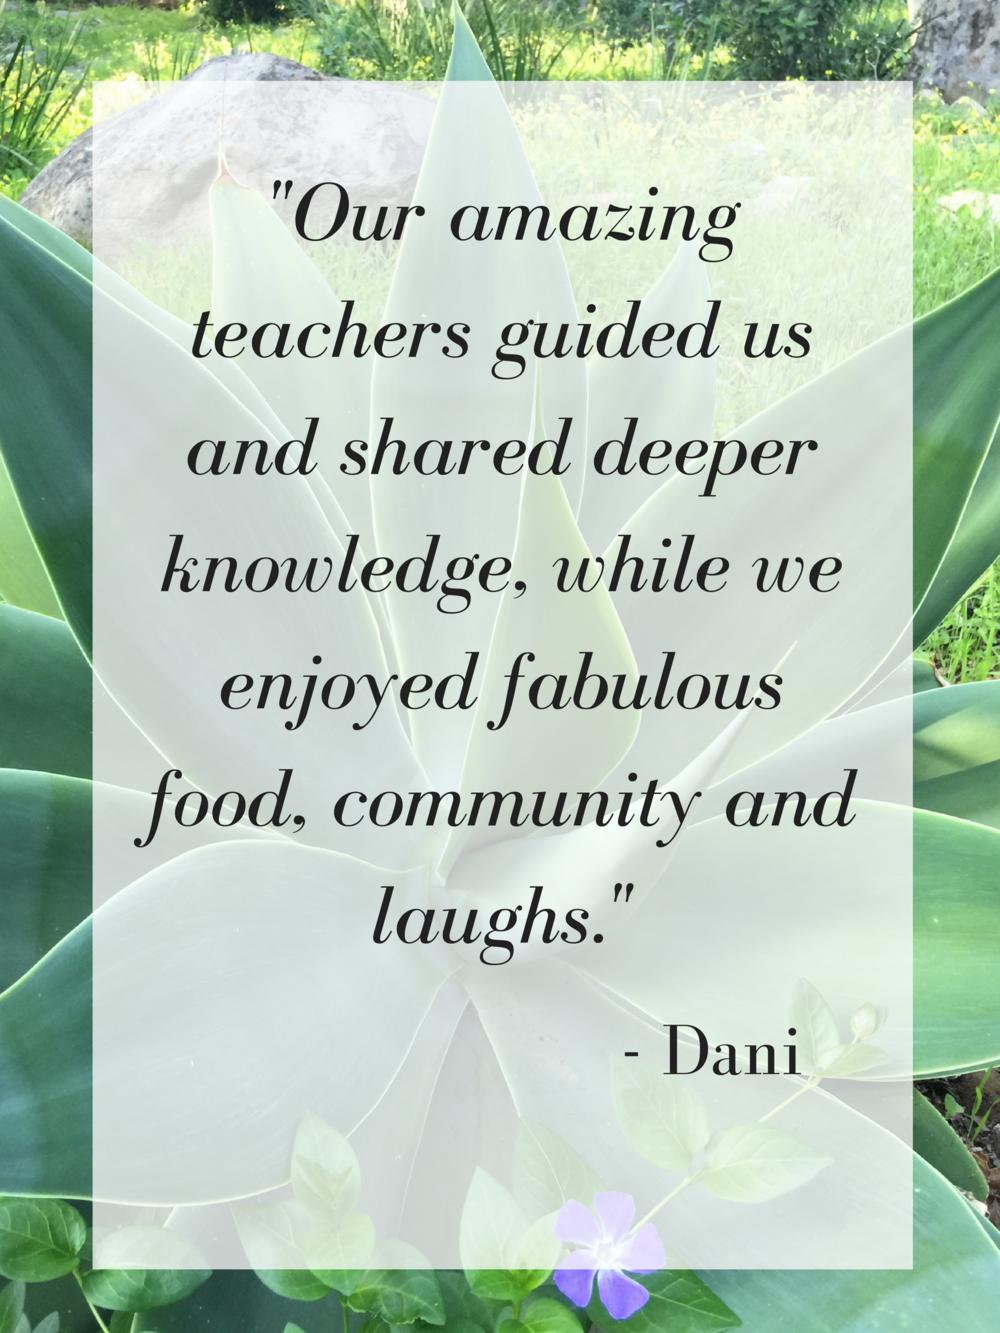 Quote Dani Casselman.png